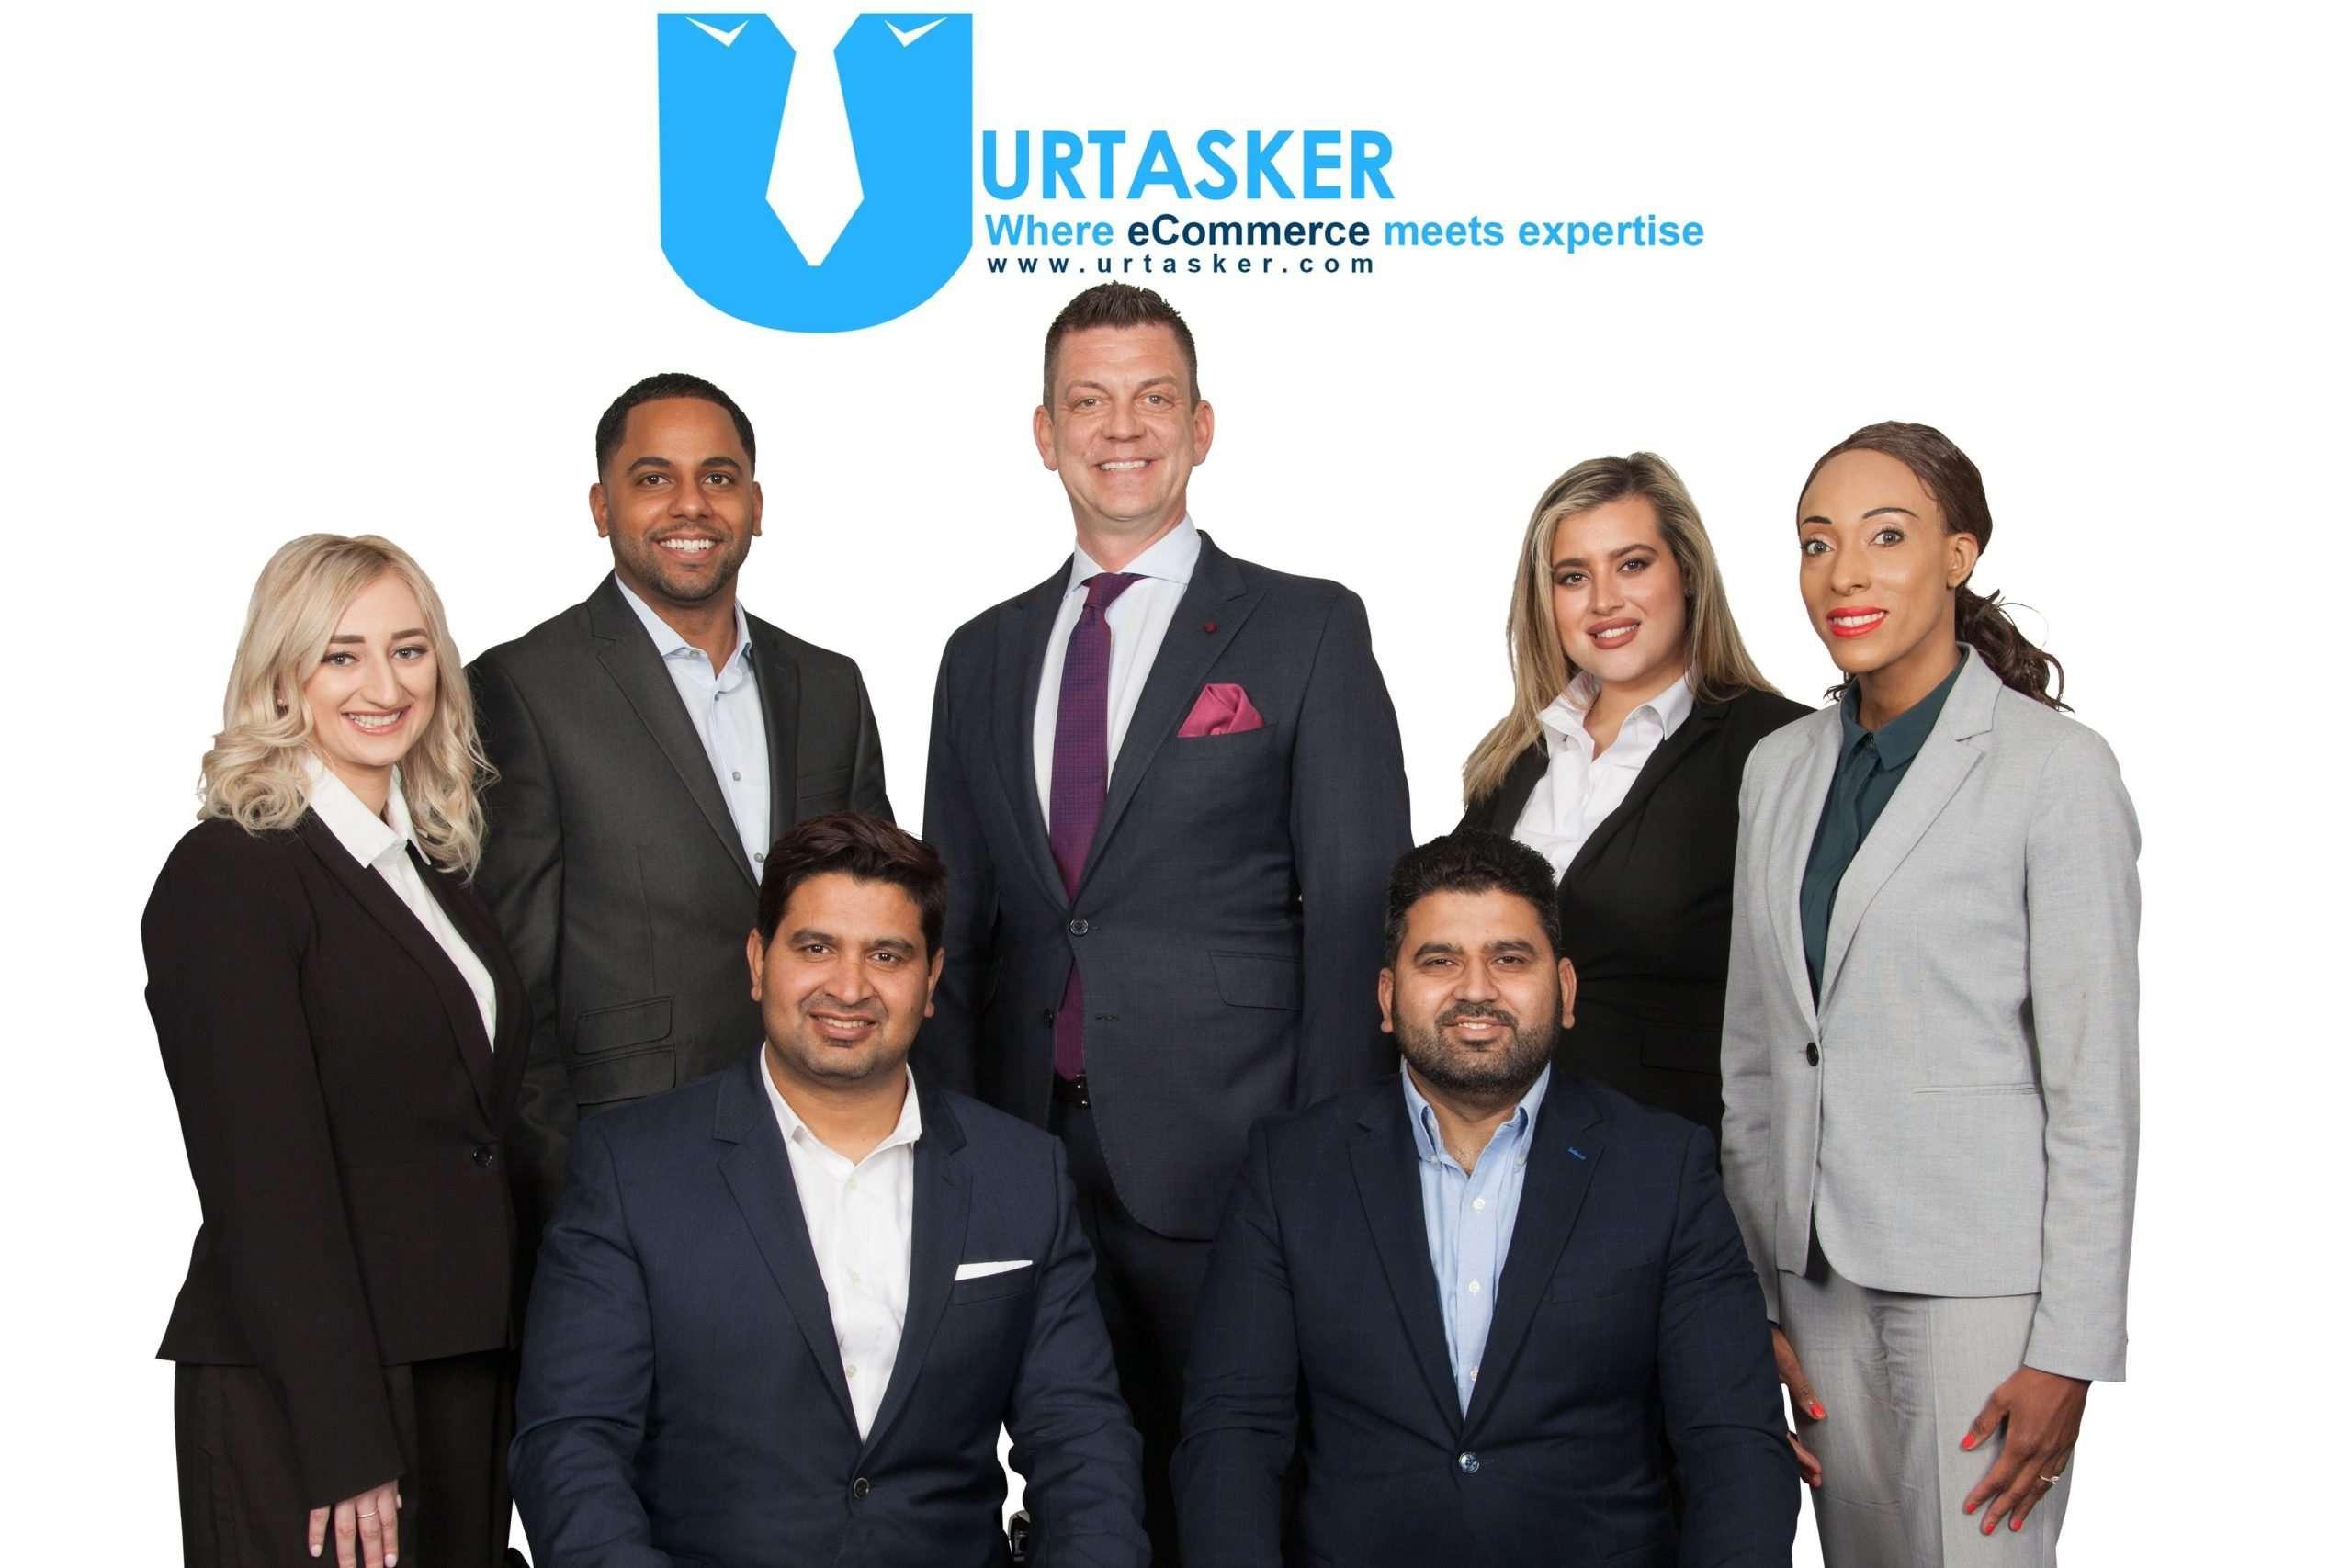 Urtasker team picture standing